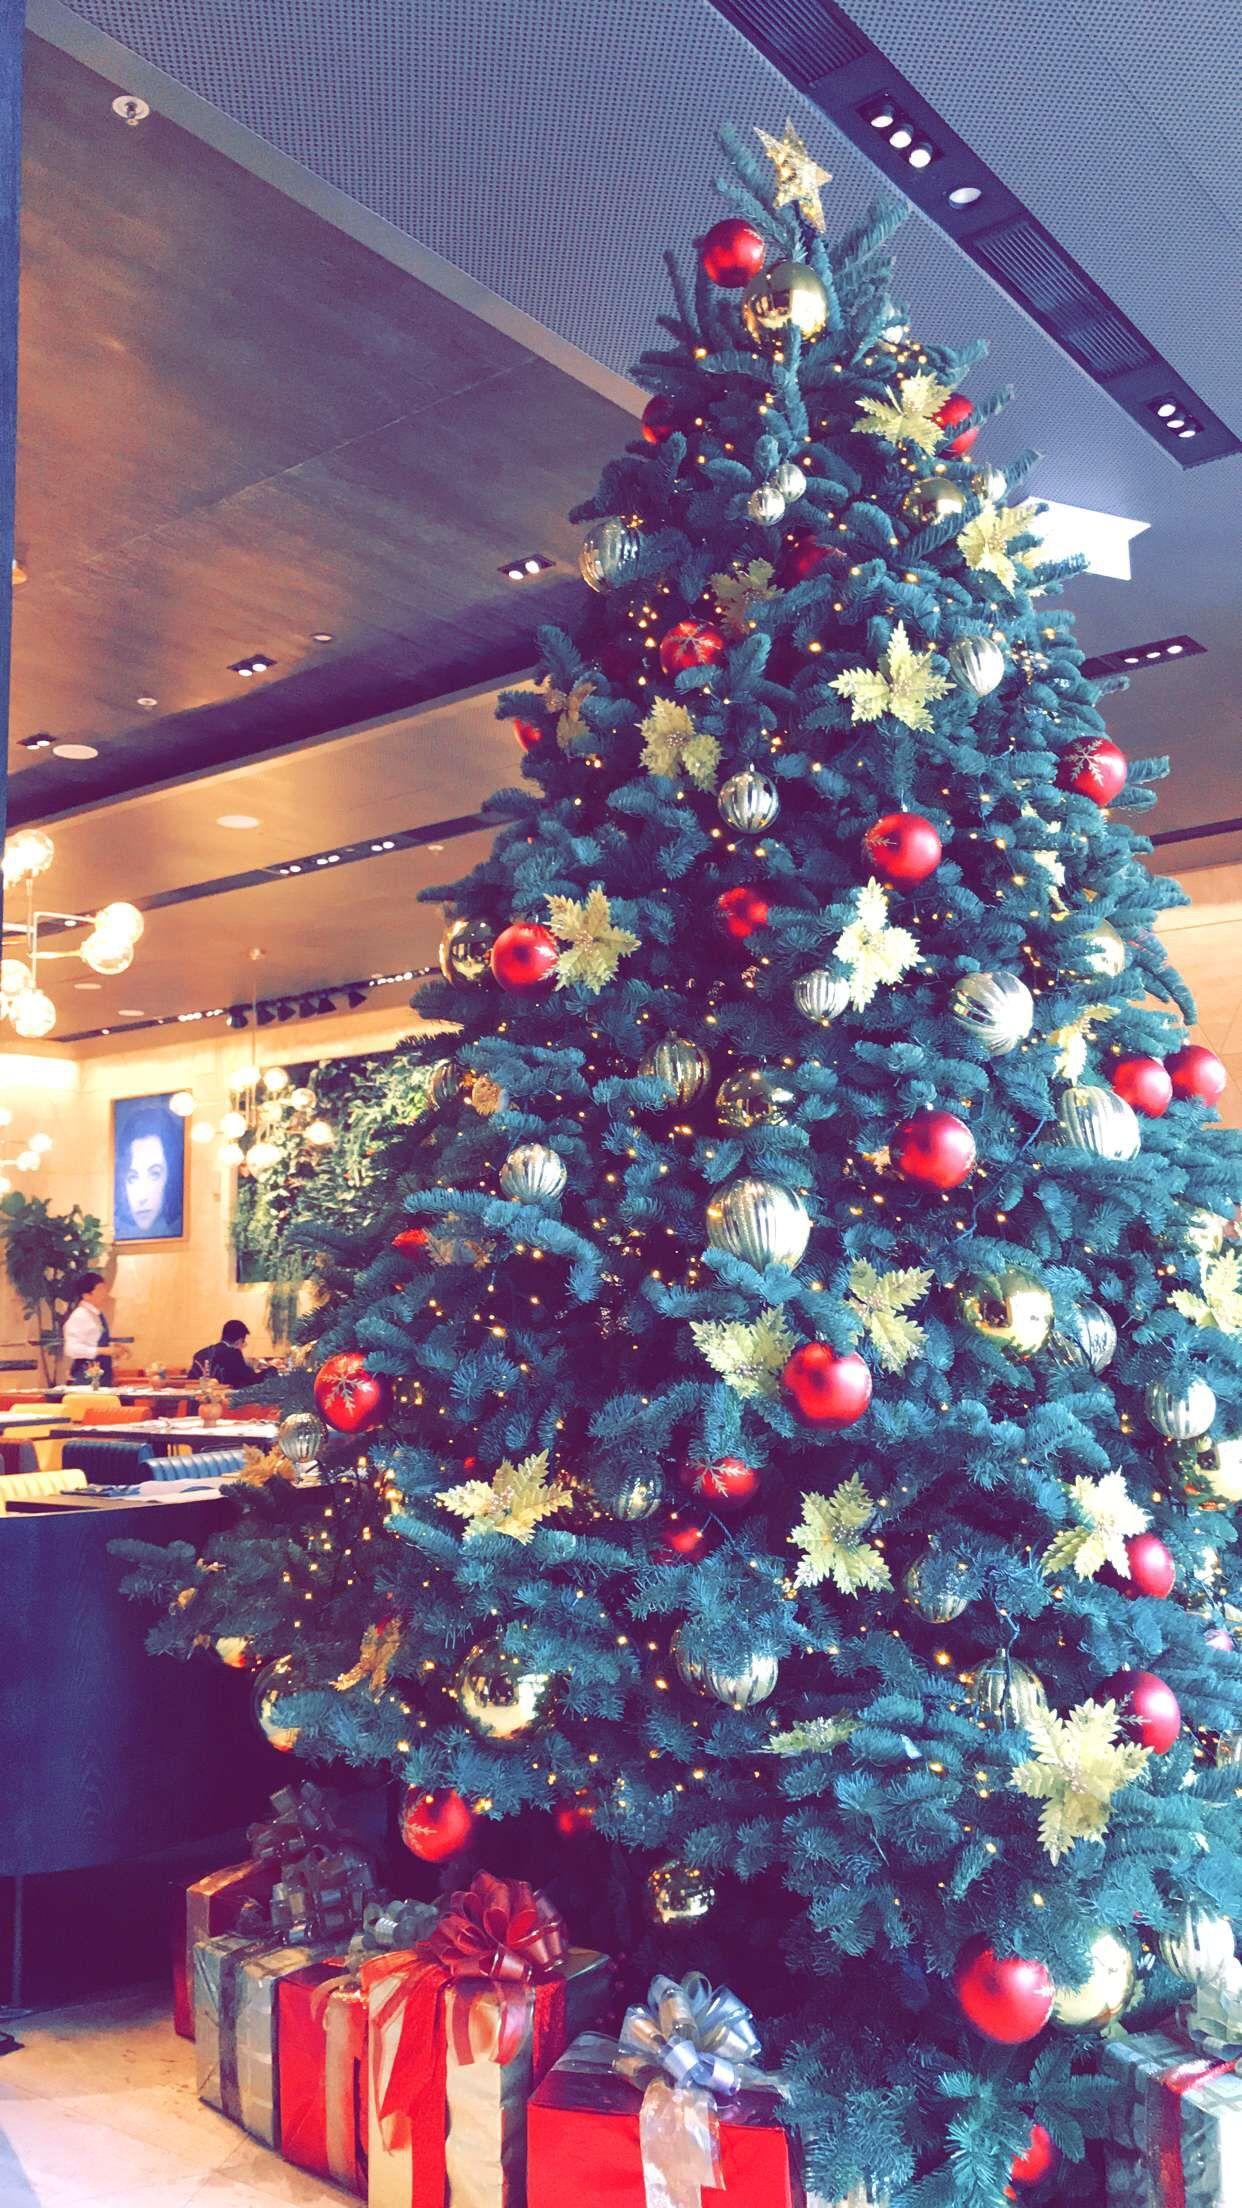 Pin By موضي البليهد On سناب موضي البليهد Xmas Wallpaper Holiday Decor Christmas Tree